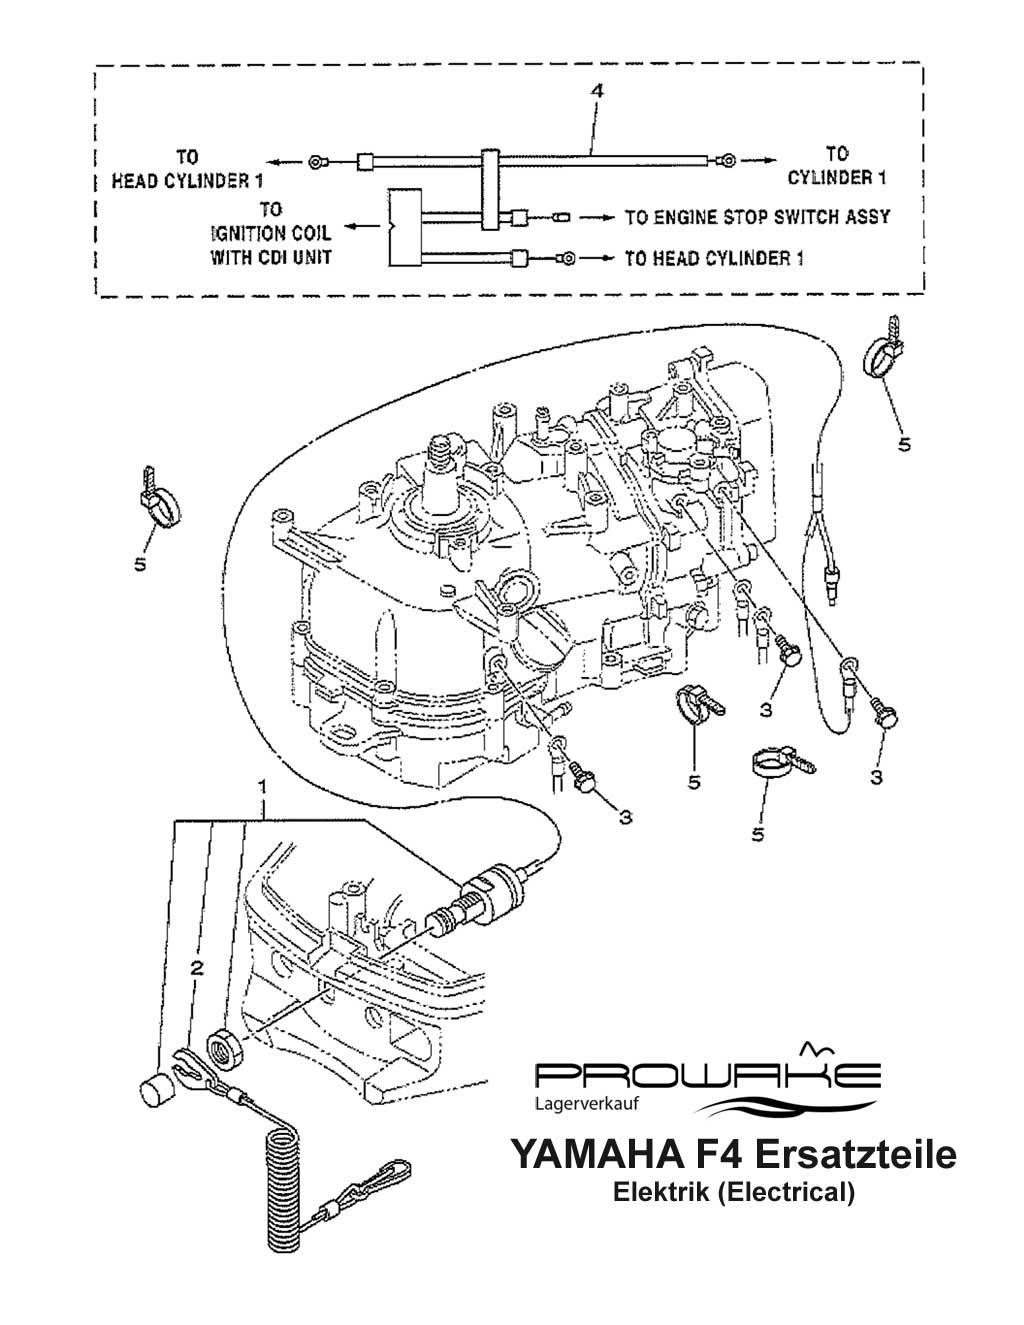 lagerverkauf yamaha f4 au enborder elektrik ersatzteil. Black Bedroom Furniture Sets. Home Design Ideas